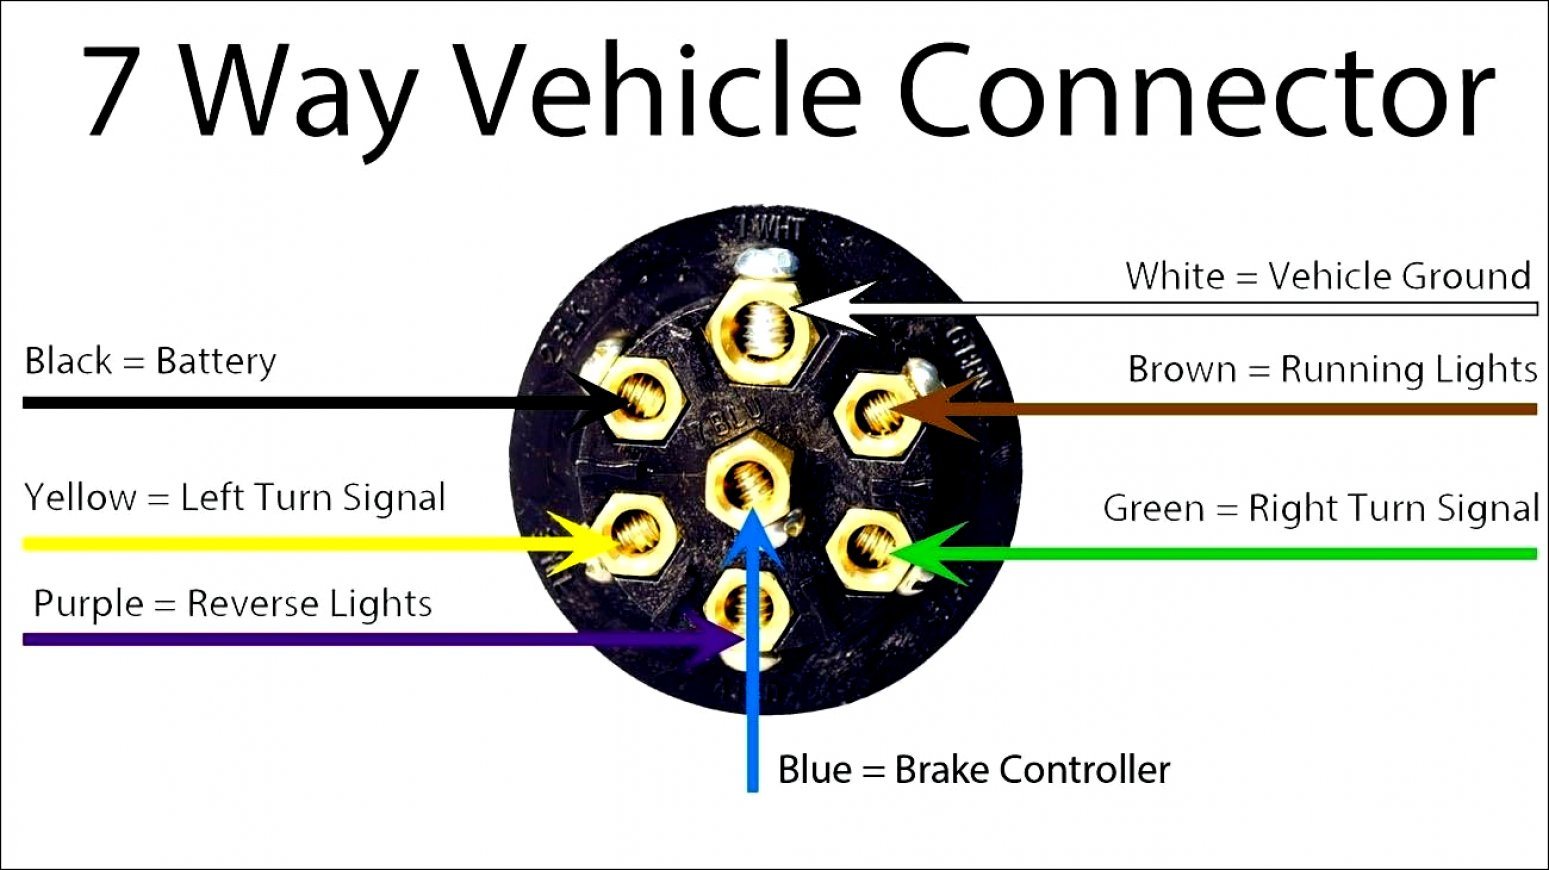 7 Way Plug Wiring Diagram Trailer | Wiring Diagram - Rv Trailer Wiring Diagram